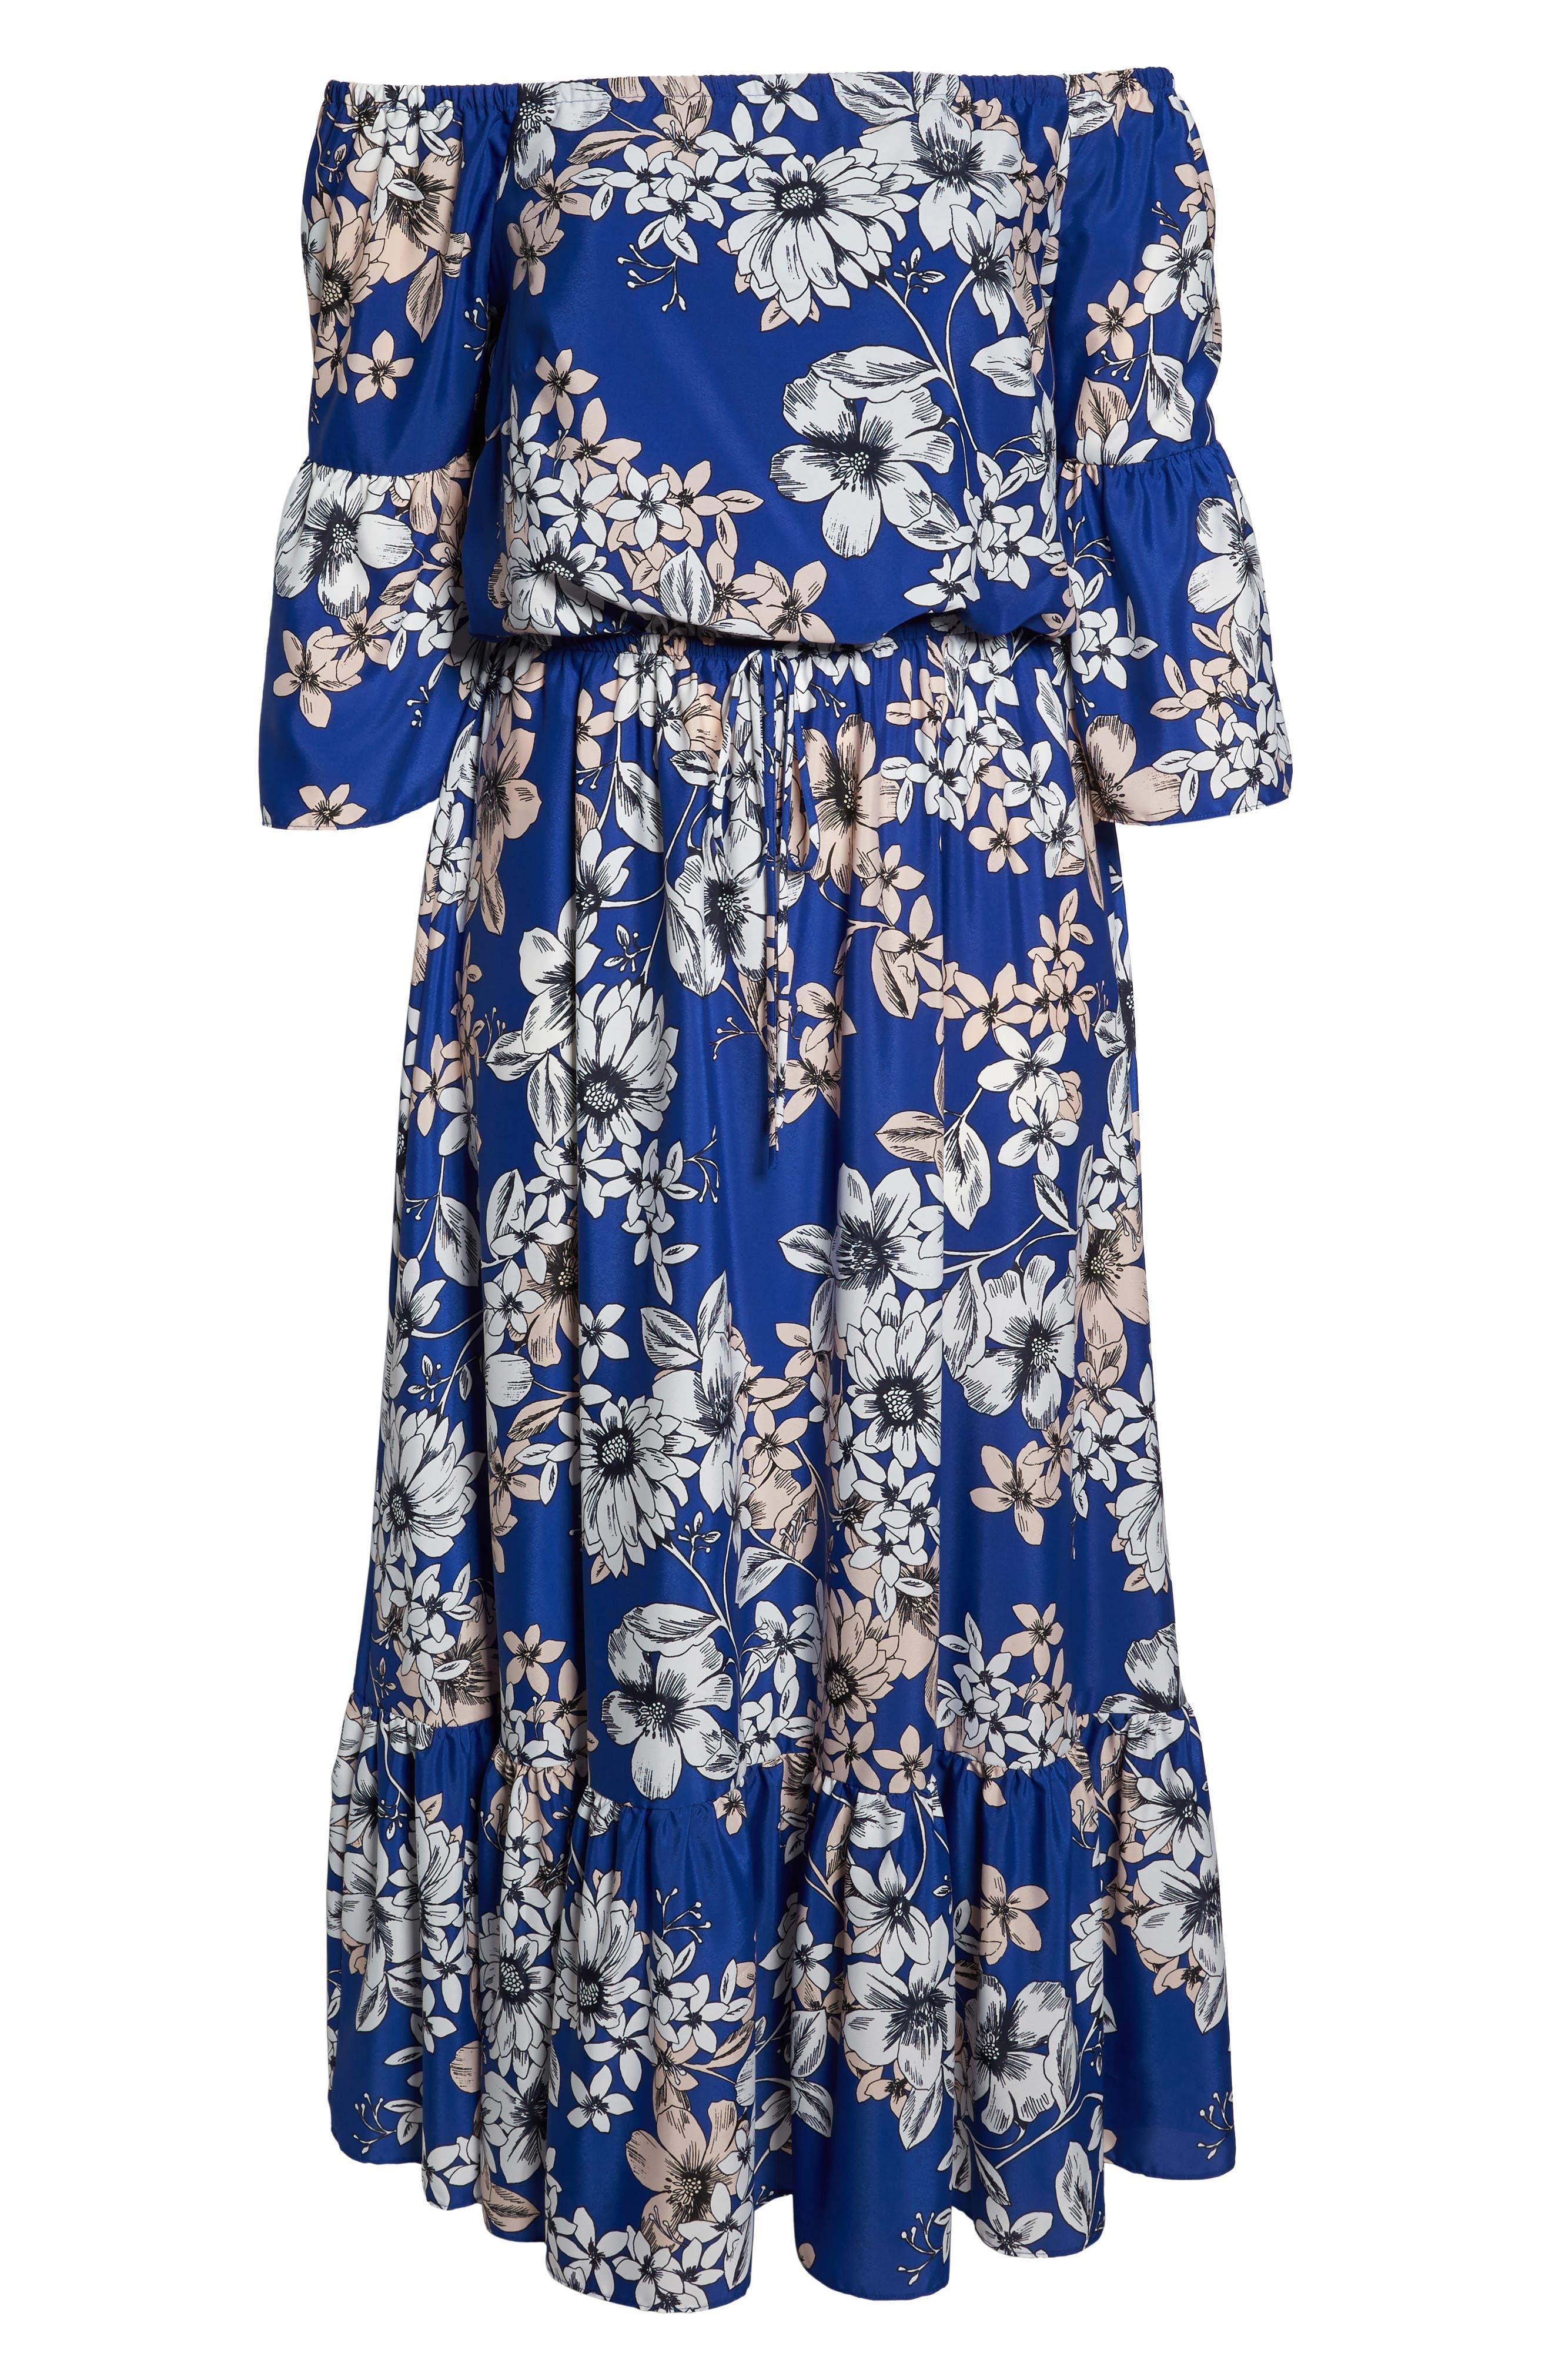 Off the Shoulder Floral Maxi Dress,                             Alternate thumbnail 6, color,                             430